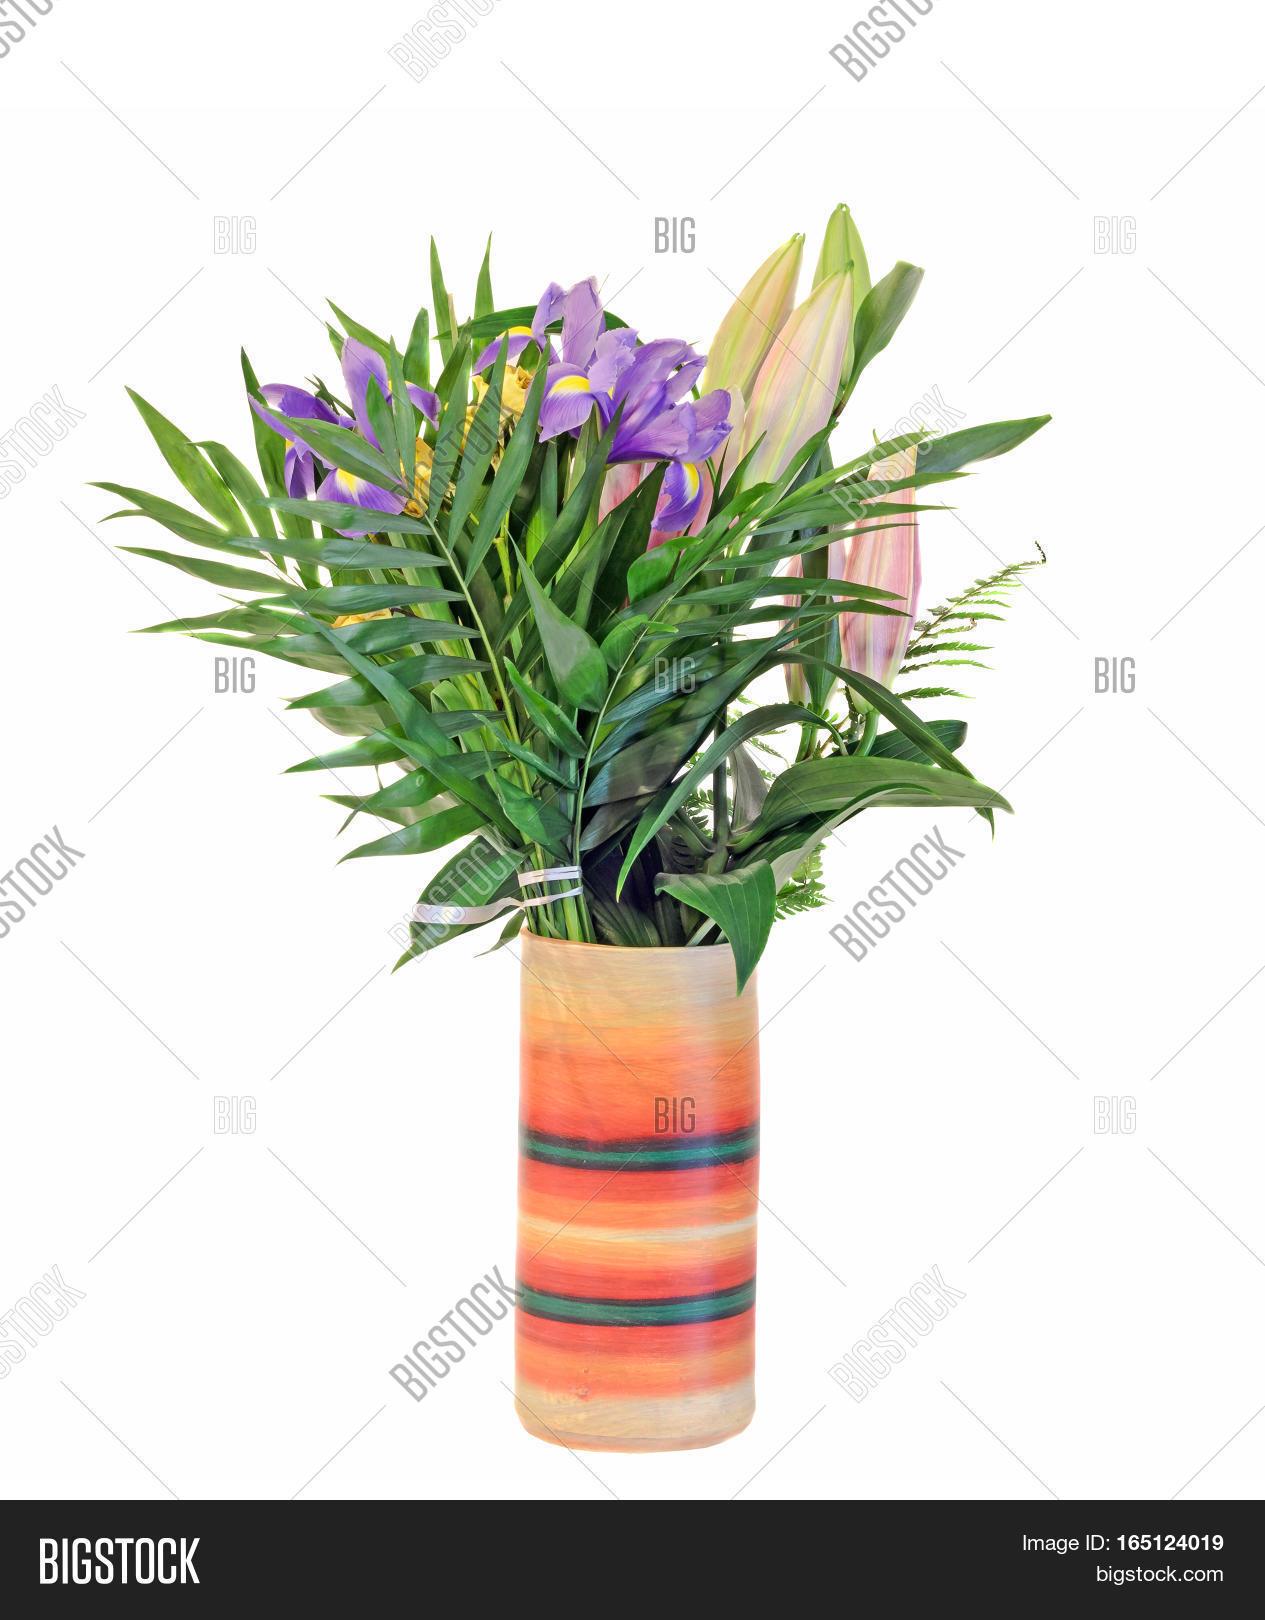 Bouquet mauve iris image photo free trial bigstock bouquet of mauve iris flowers with lilies buds in a vibrant colored vase floral arrangement izmirmasajfo